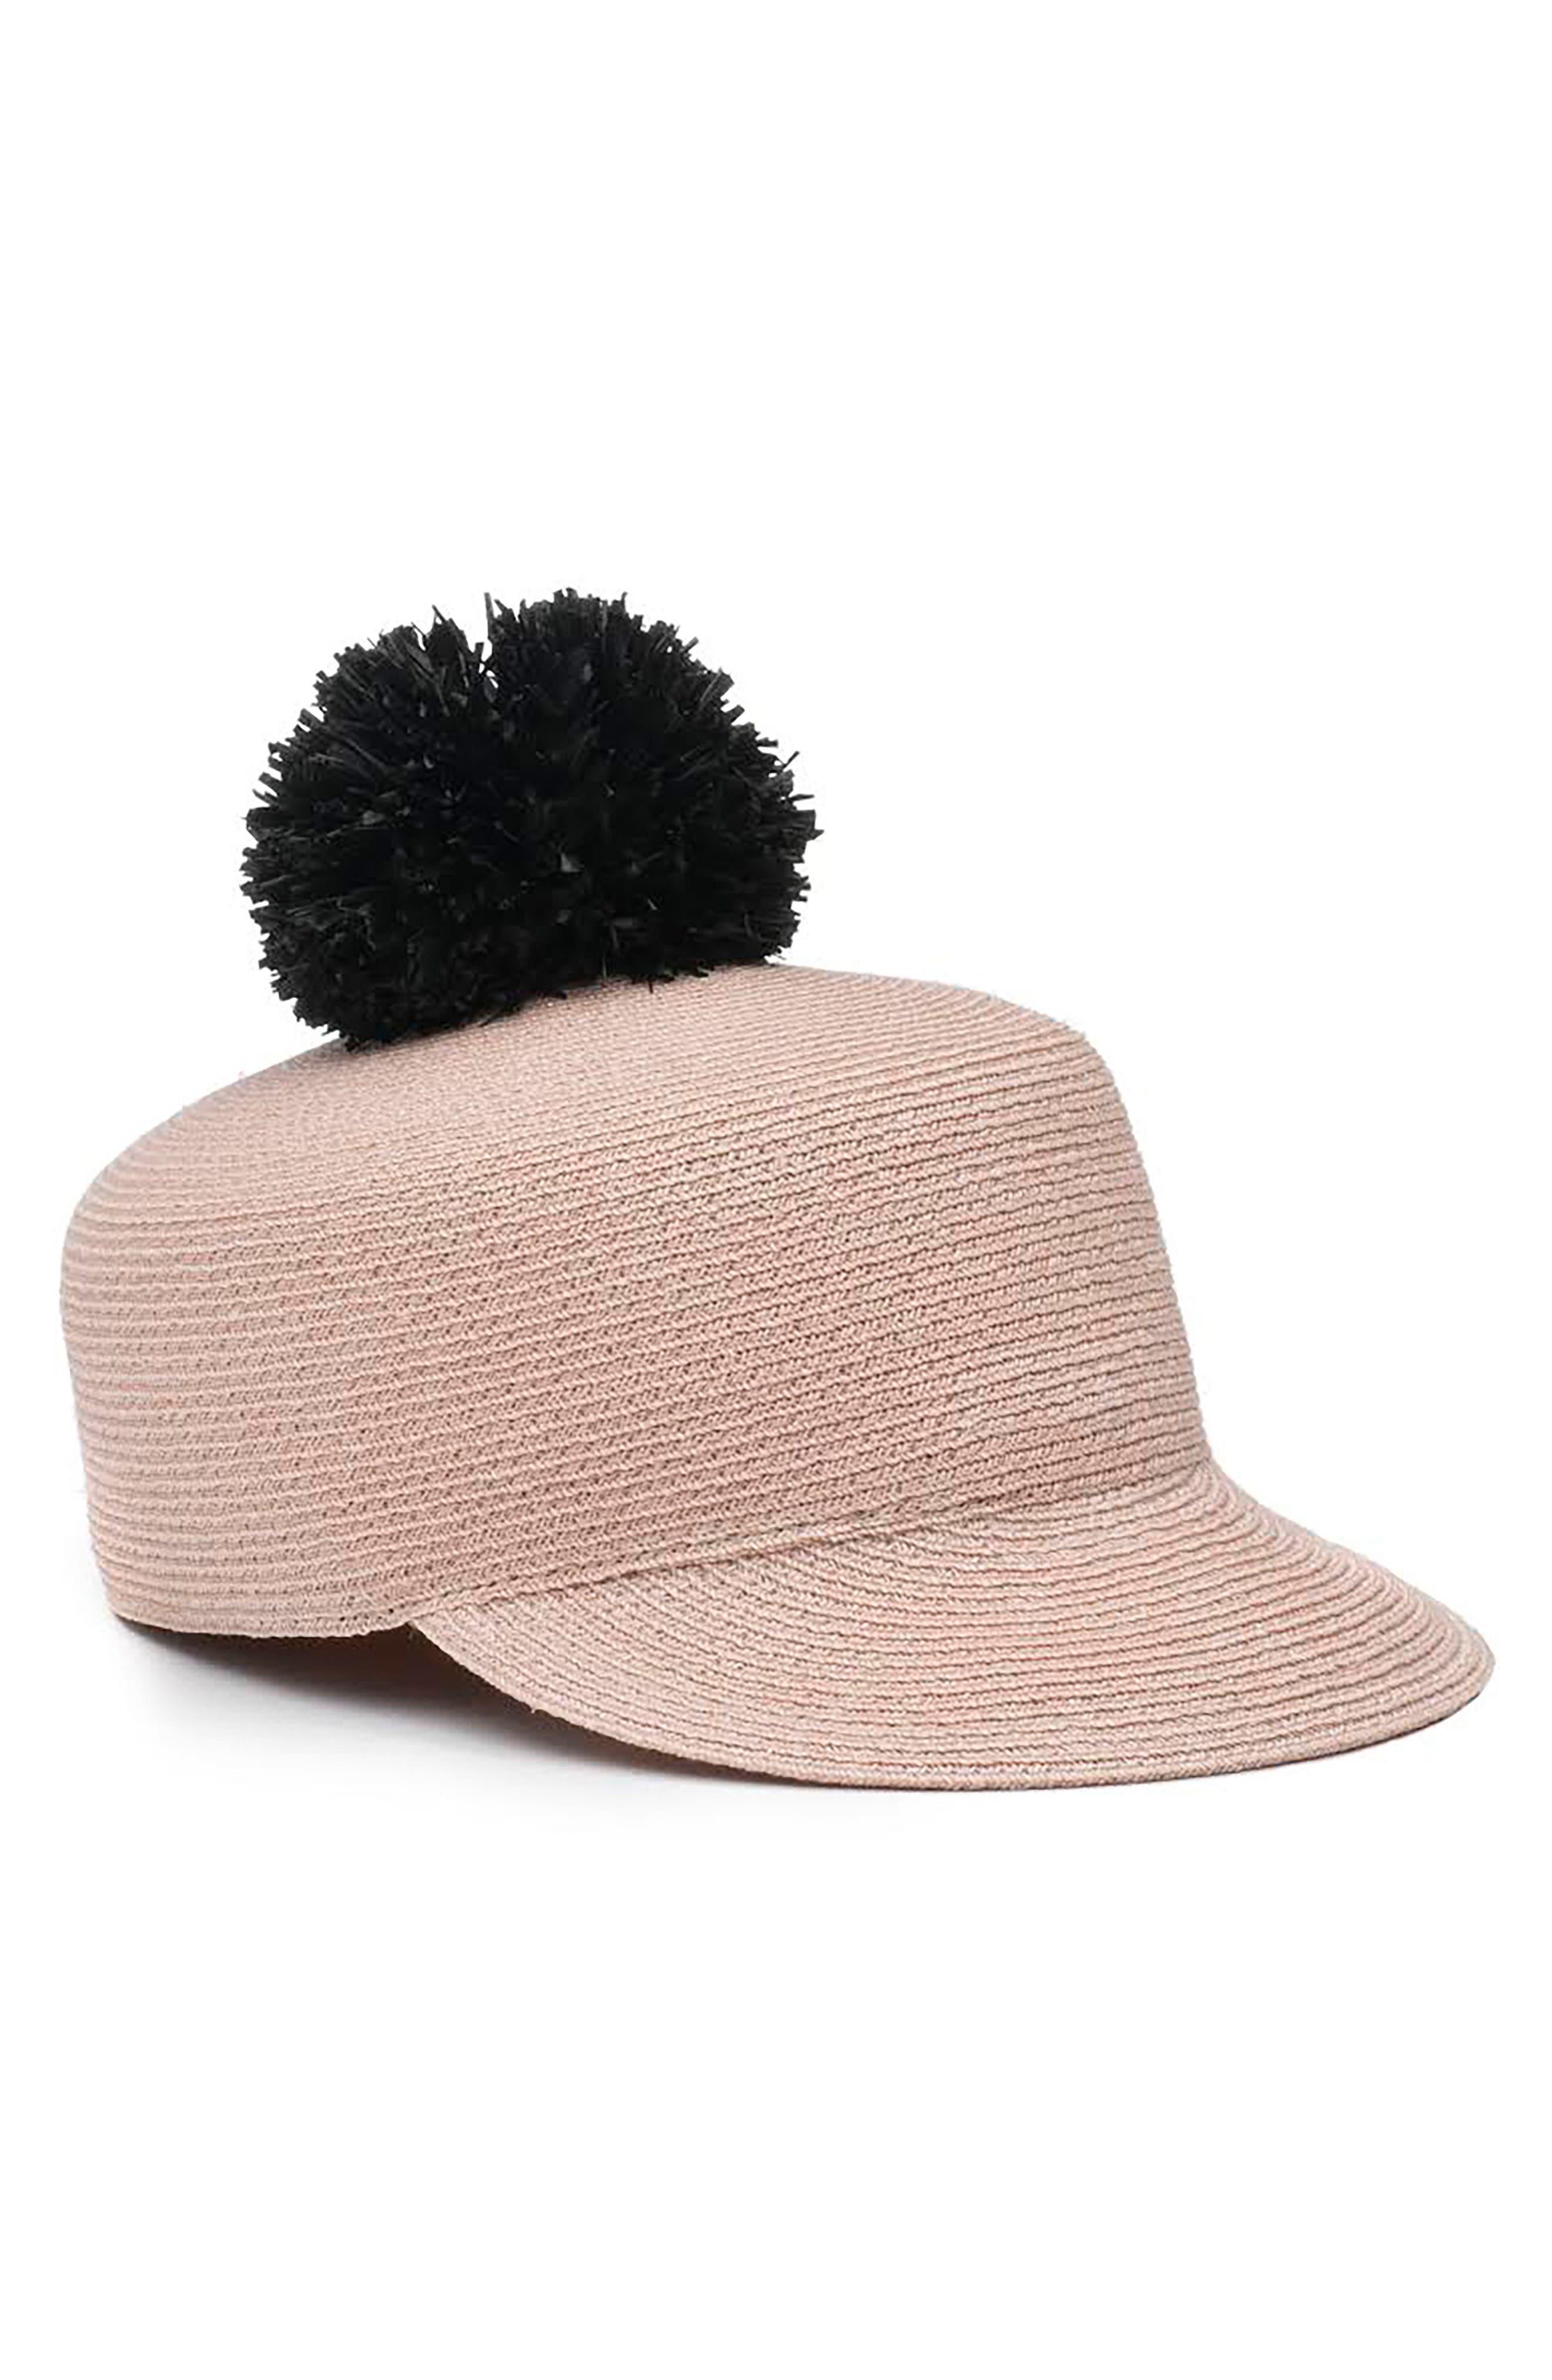 Alternate Image 1 Selected - Eugenia Kim Pom Straw Hat